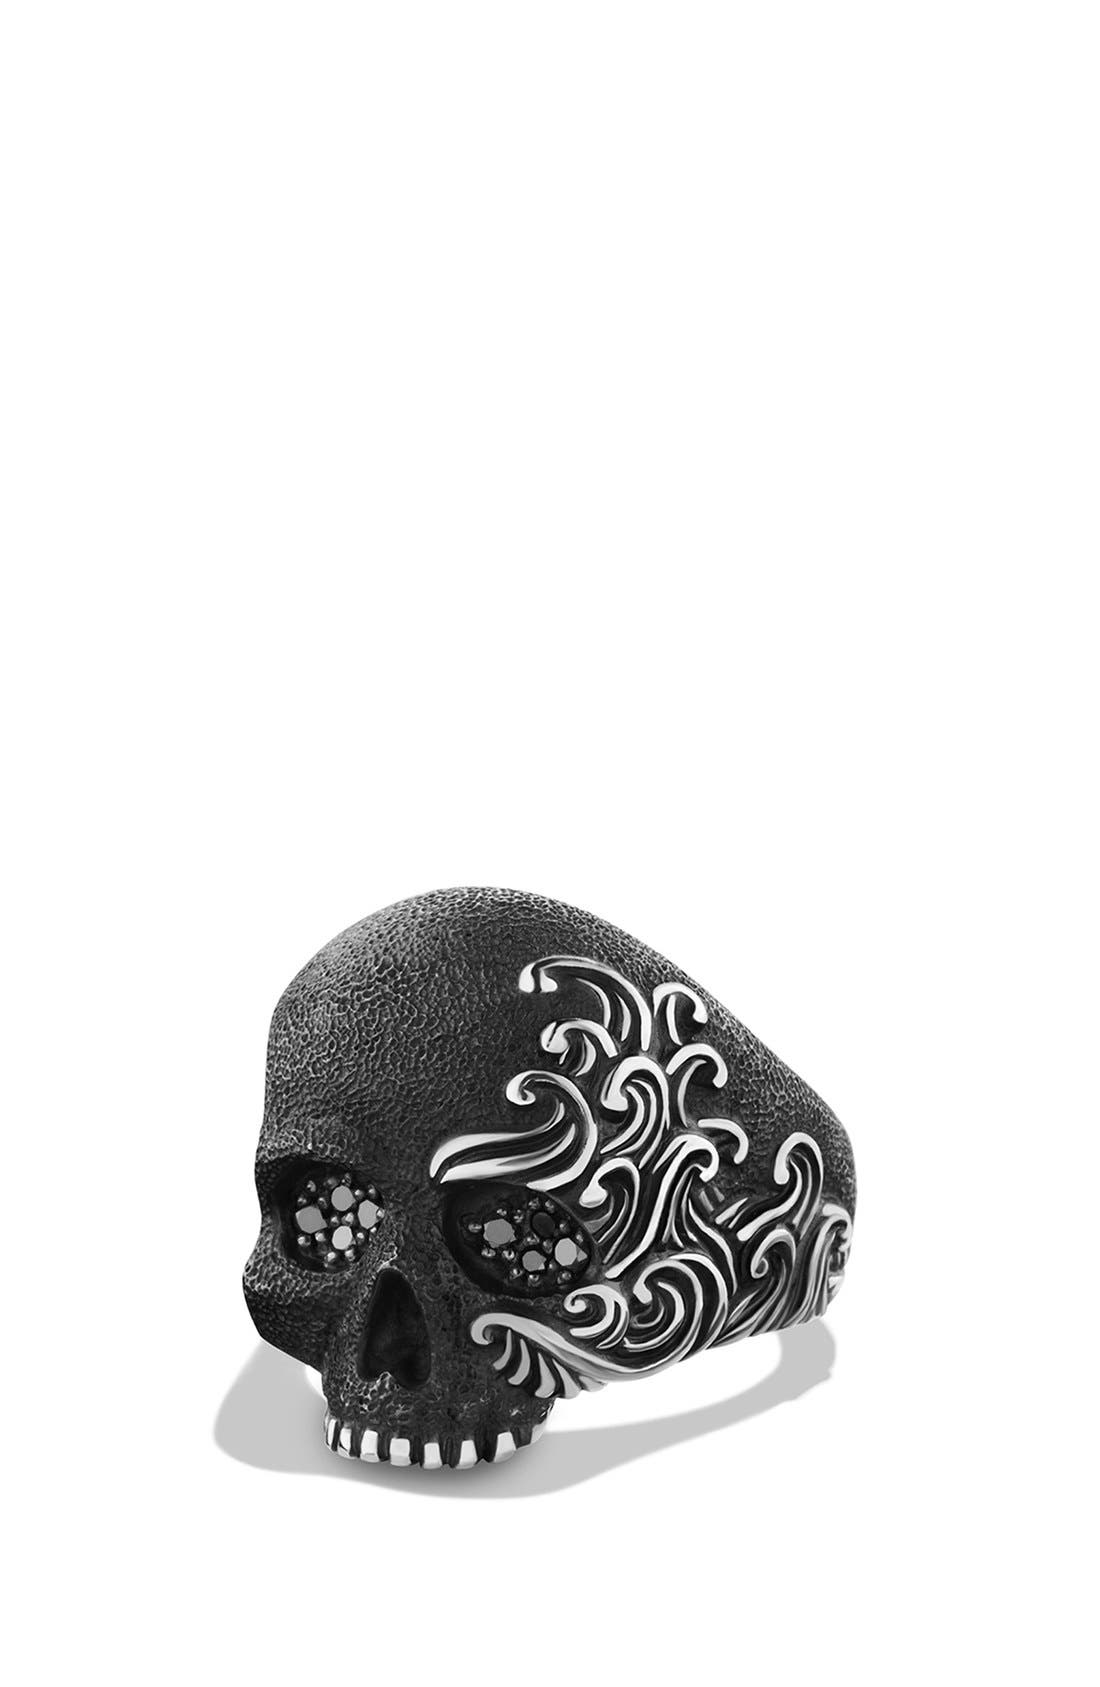 'Waves' Large Skull Ring with Black Diamonds,                             Main thumbnail 1, color,                             BLACK DIAMOND